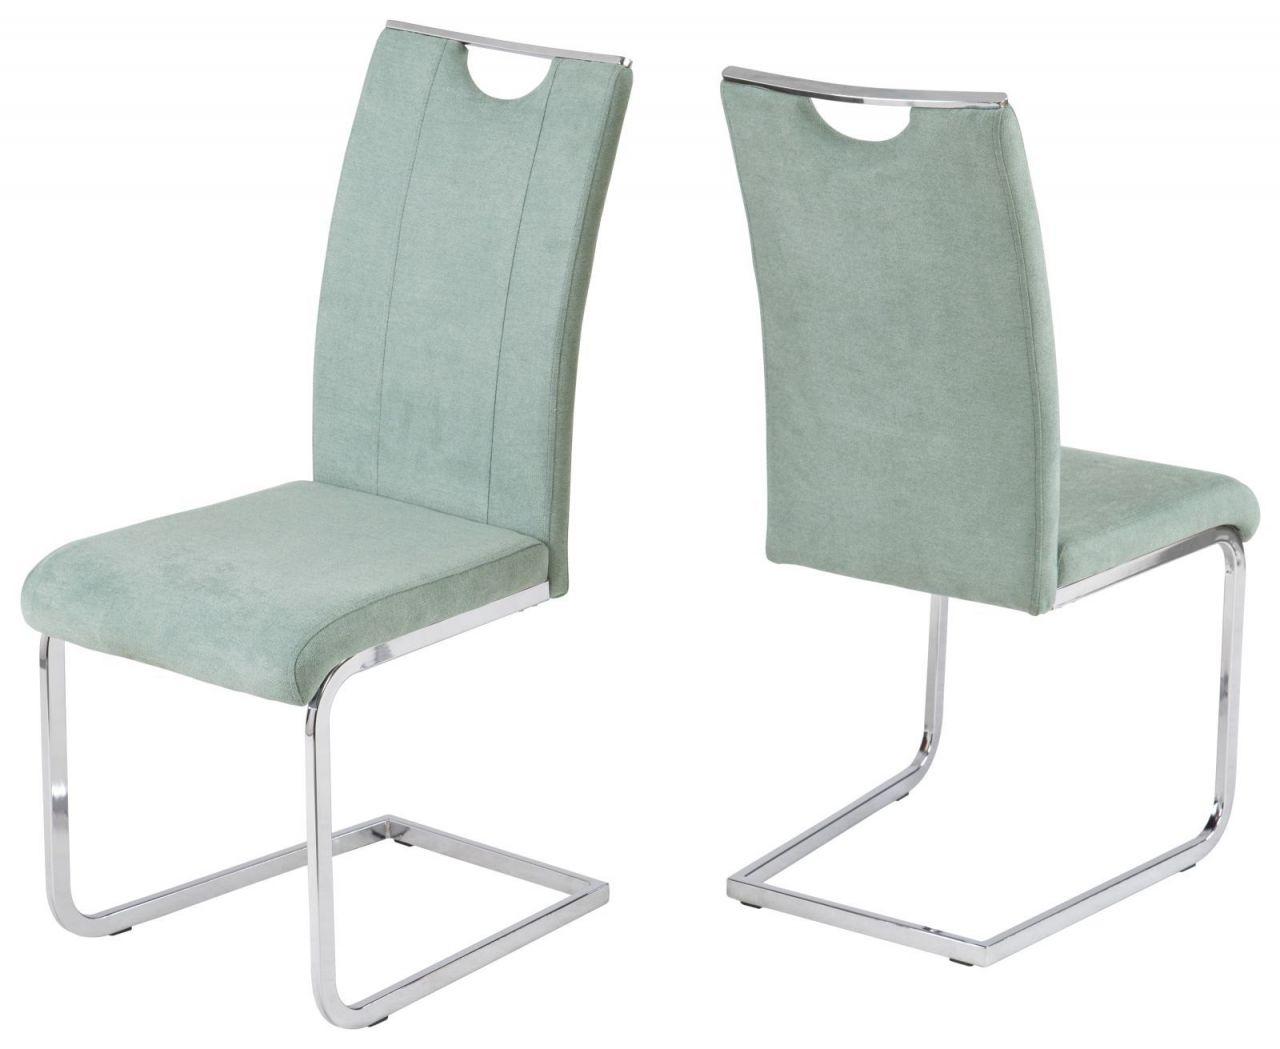 4er Pack Freischwinger Stuhl 4 Farben Grau Mint Latte Flamingo Kufengestell Verchromt R July Kaufen Bei Eh Mobel